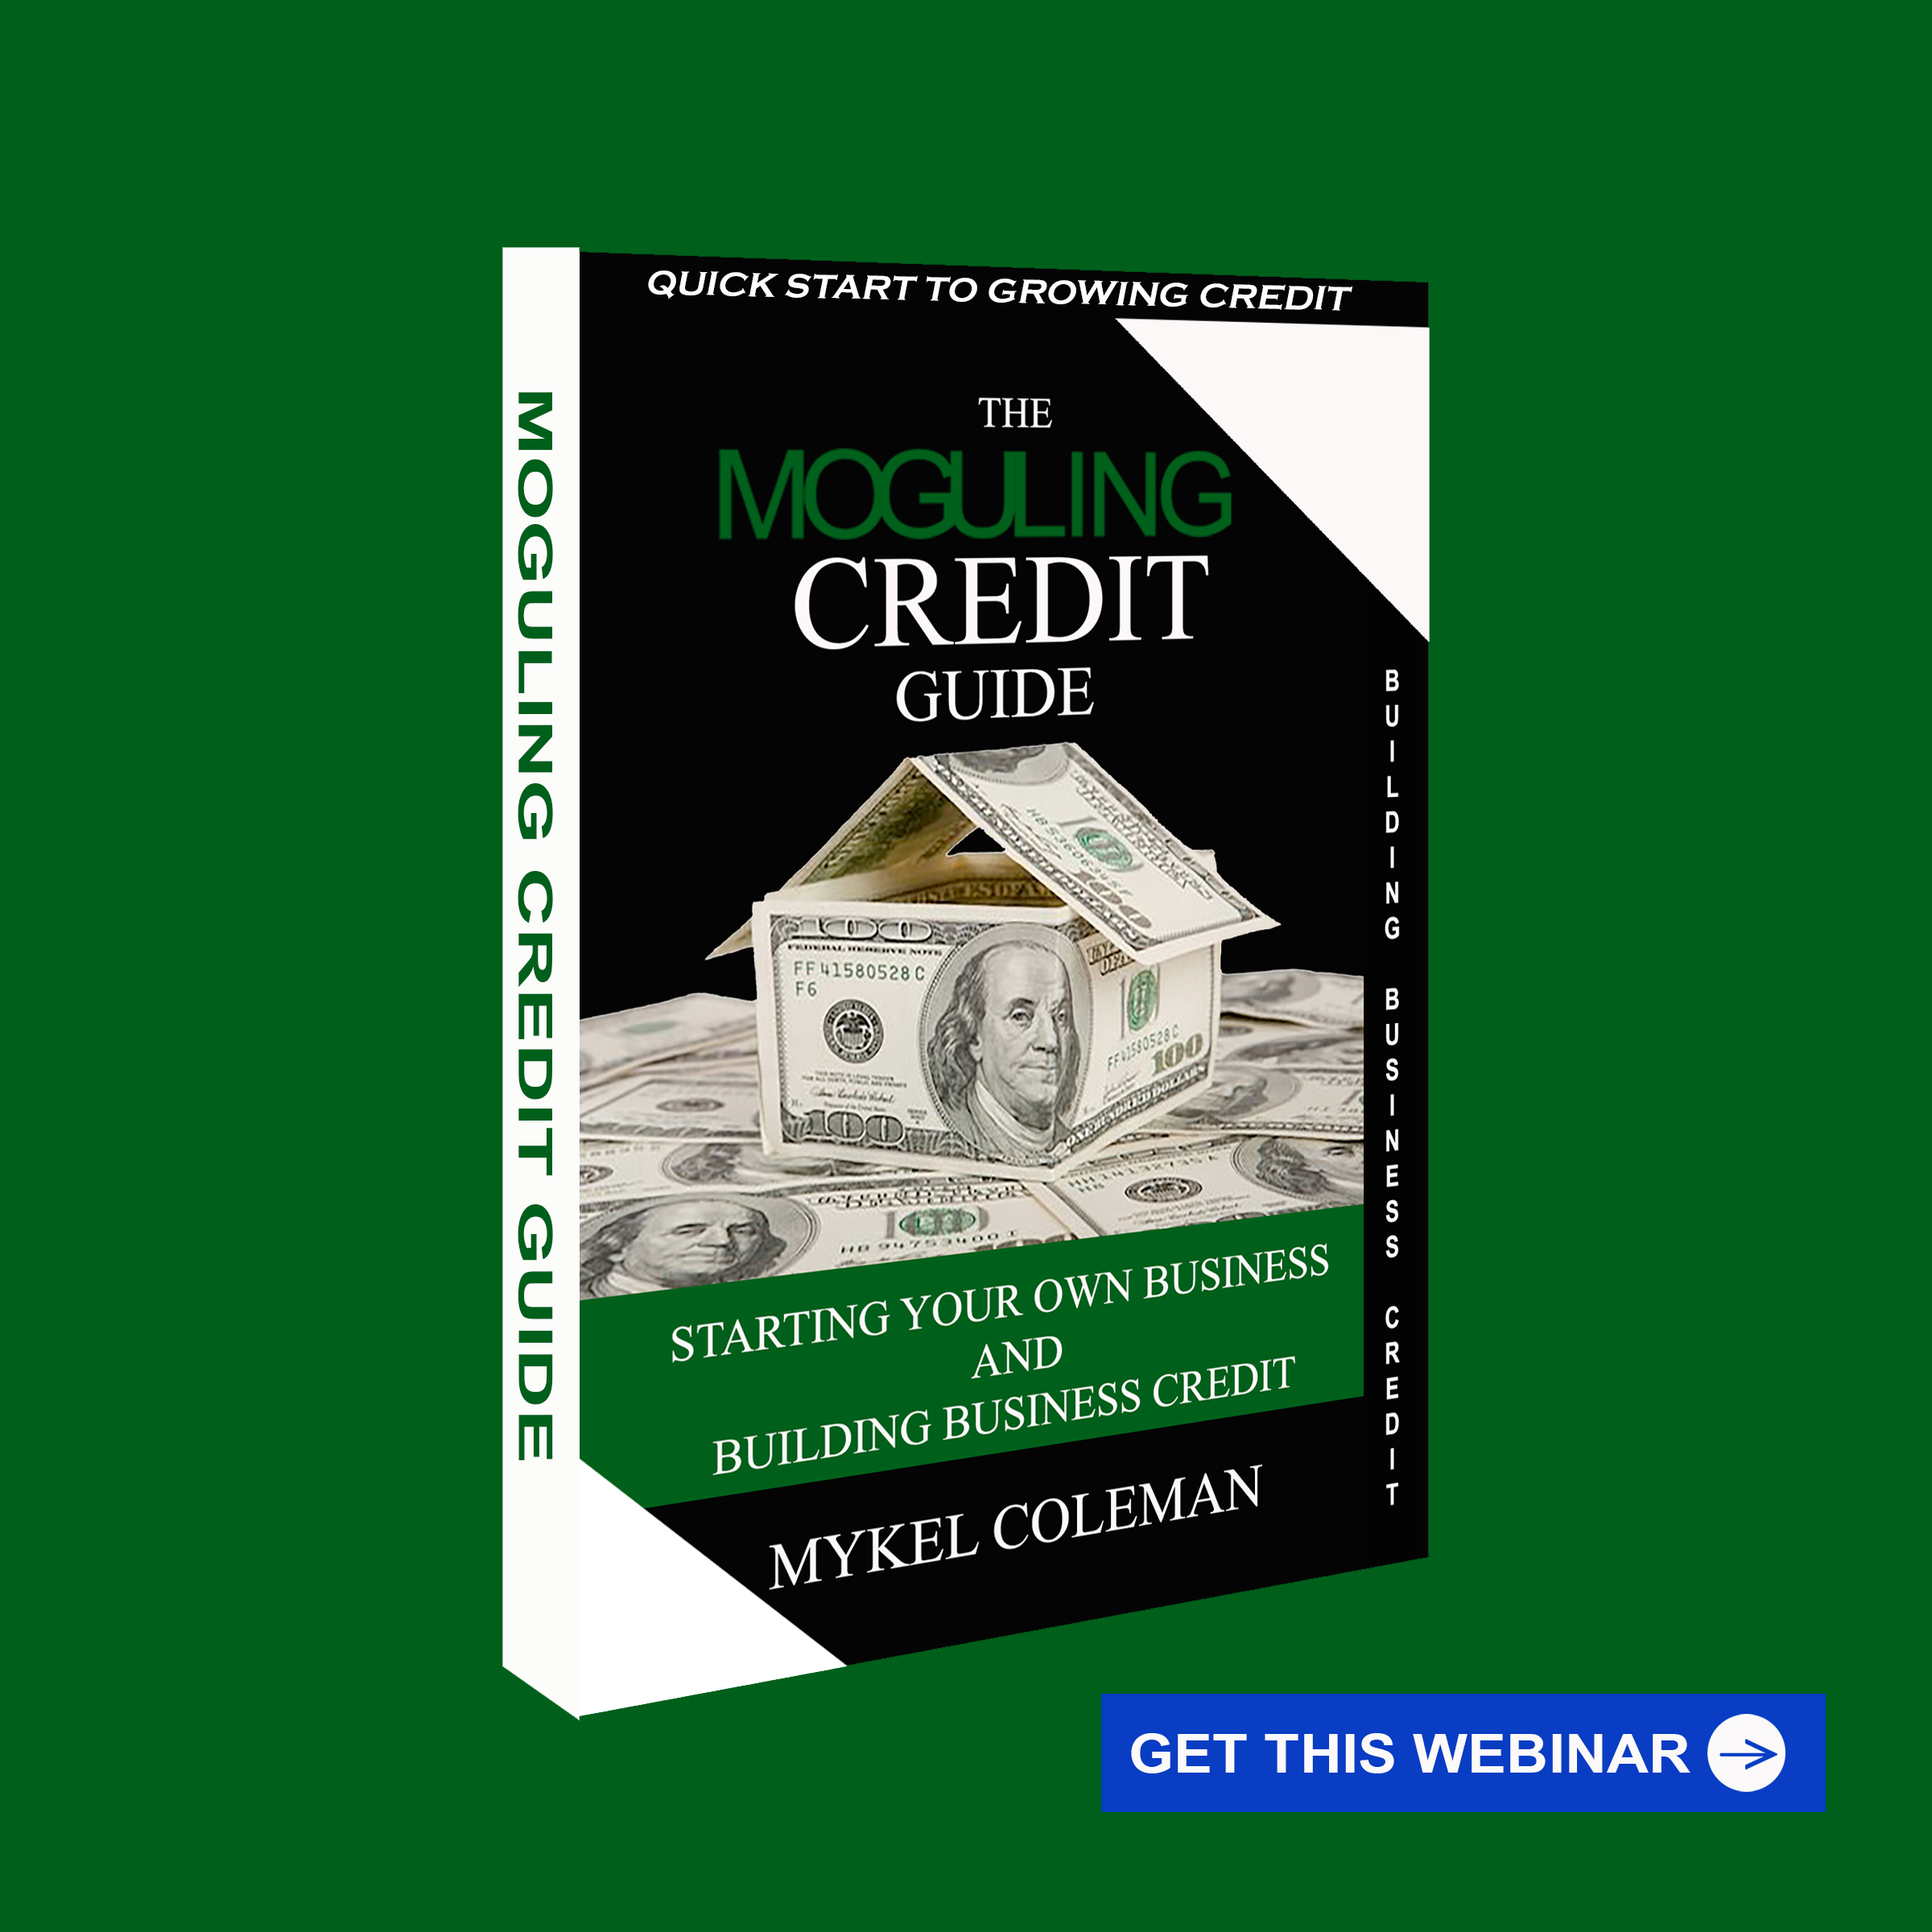 Moguling Credit Guide - Webinar